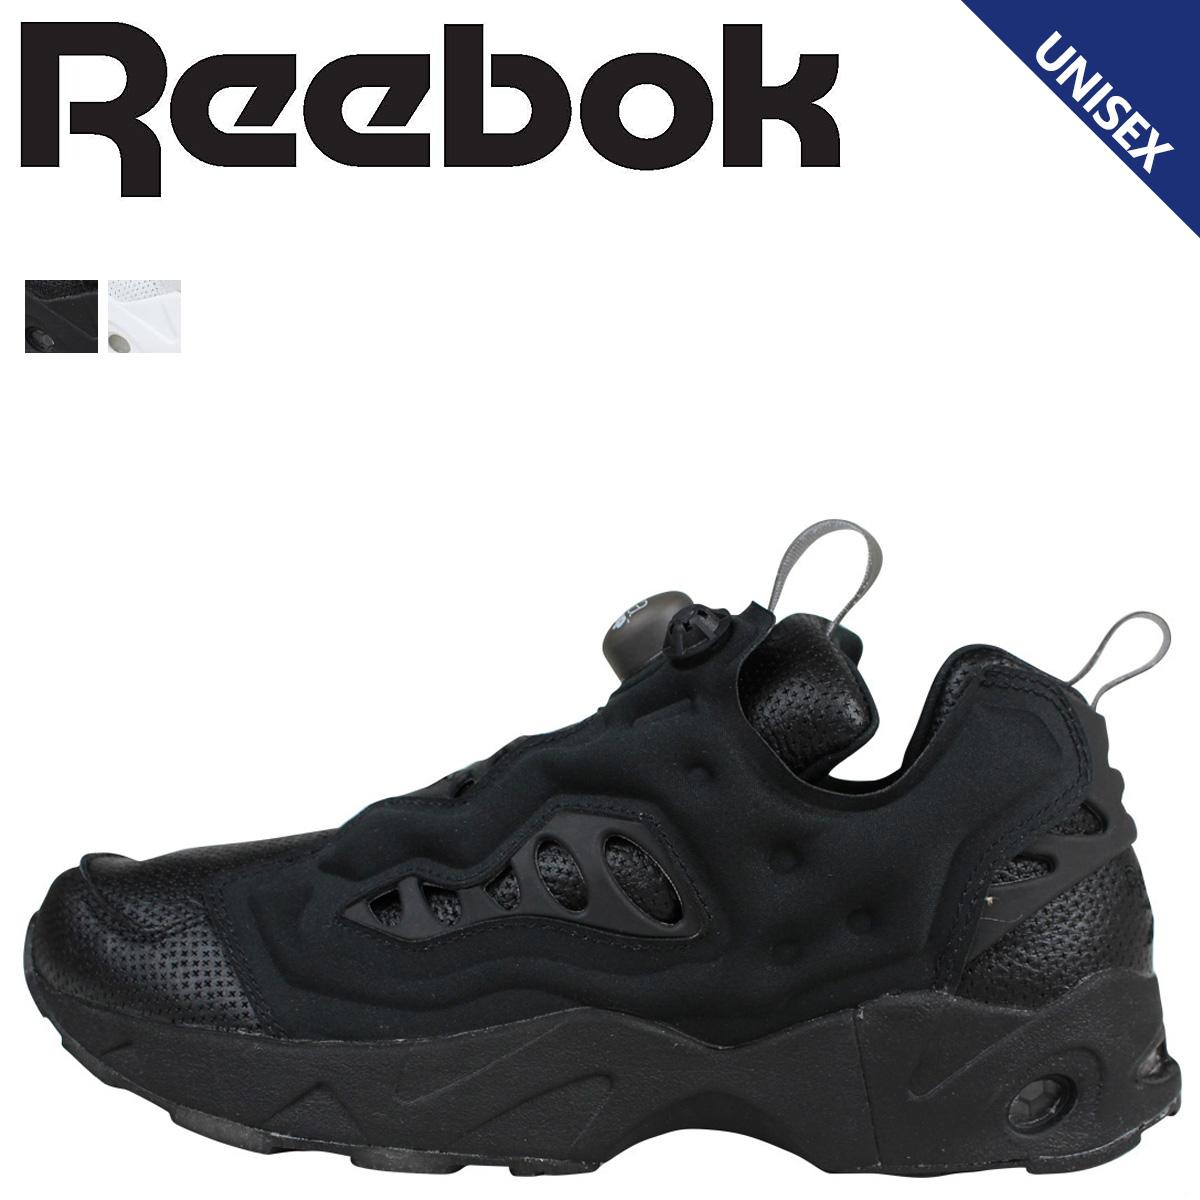 0a9d271eb4e Whats up Sports  Reebok Reebok pump fury sneakers INSTAPUMP FURY ...